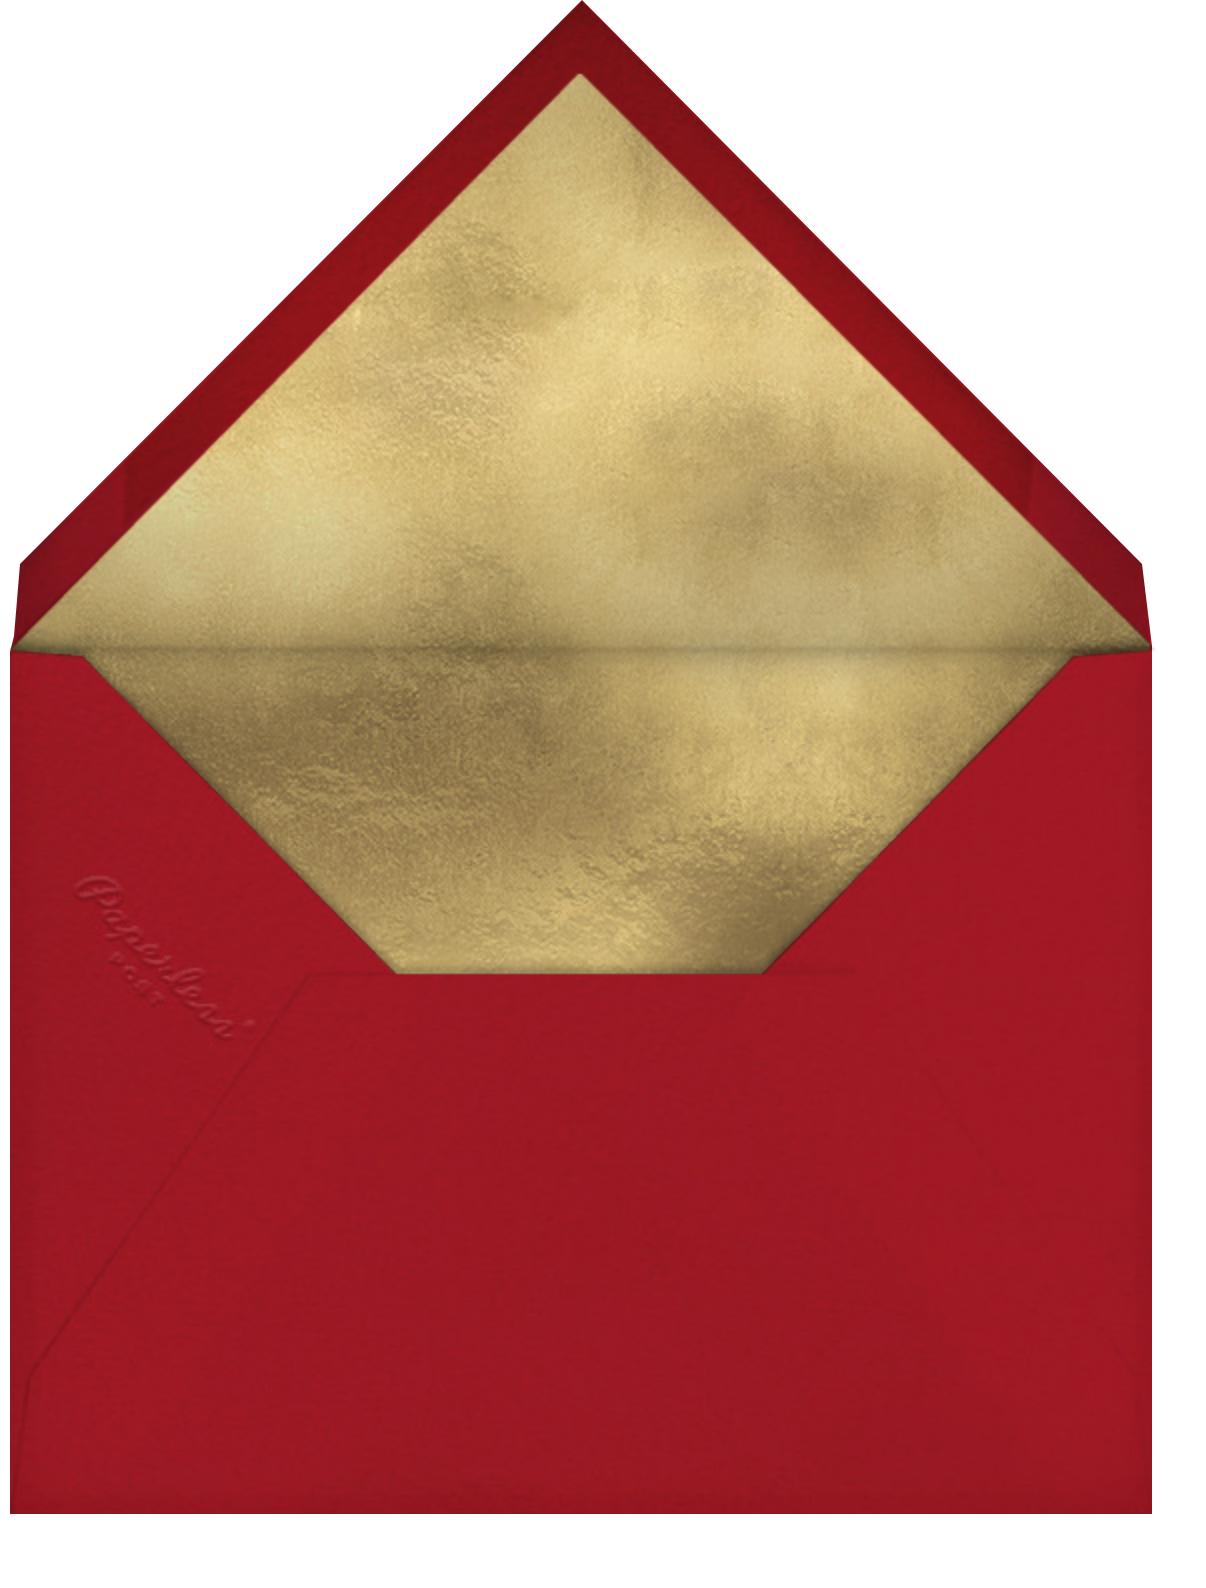 Mitzvah Marquee - Bat - Paperless Post - Bat and bar mitzvah - envelope back